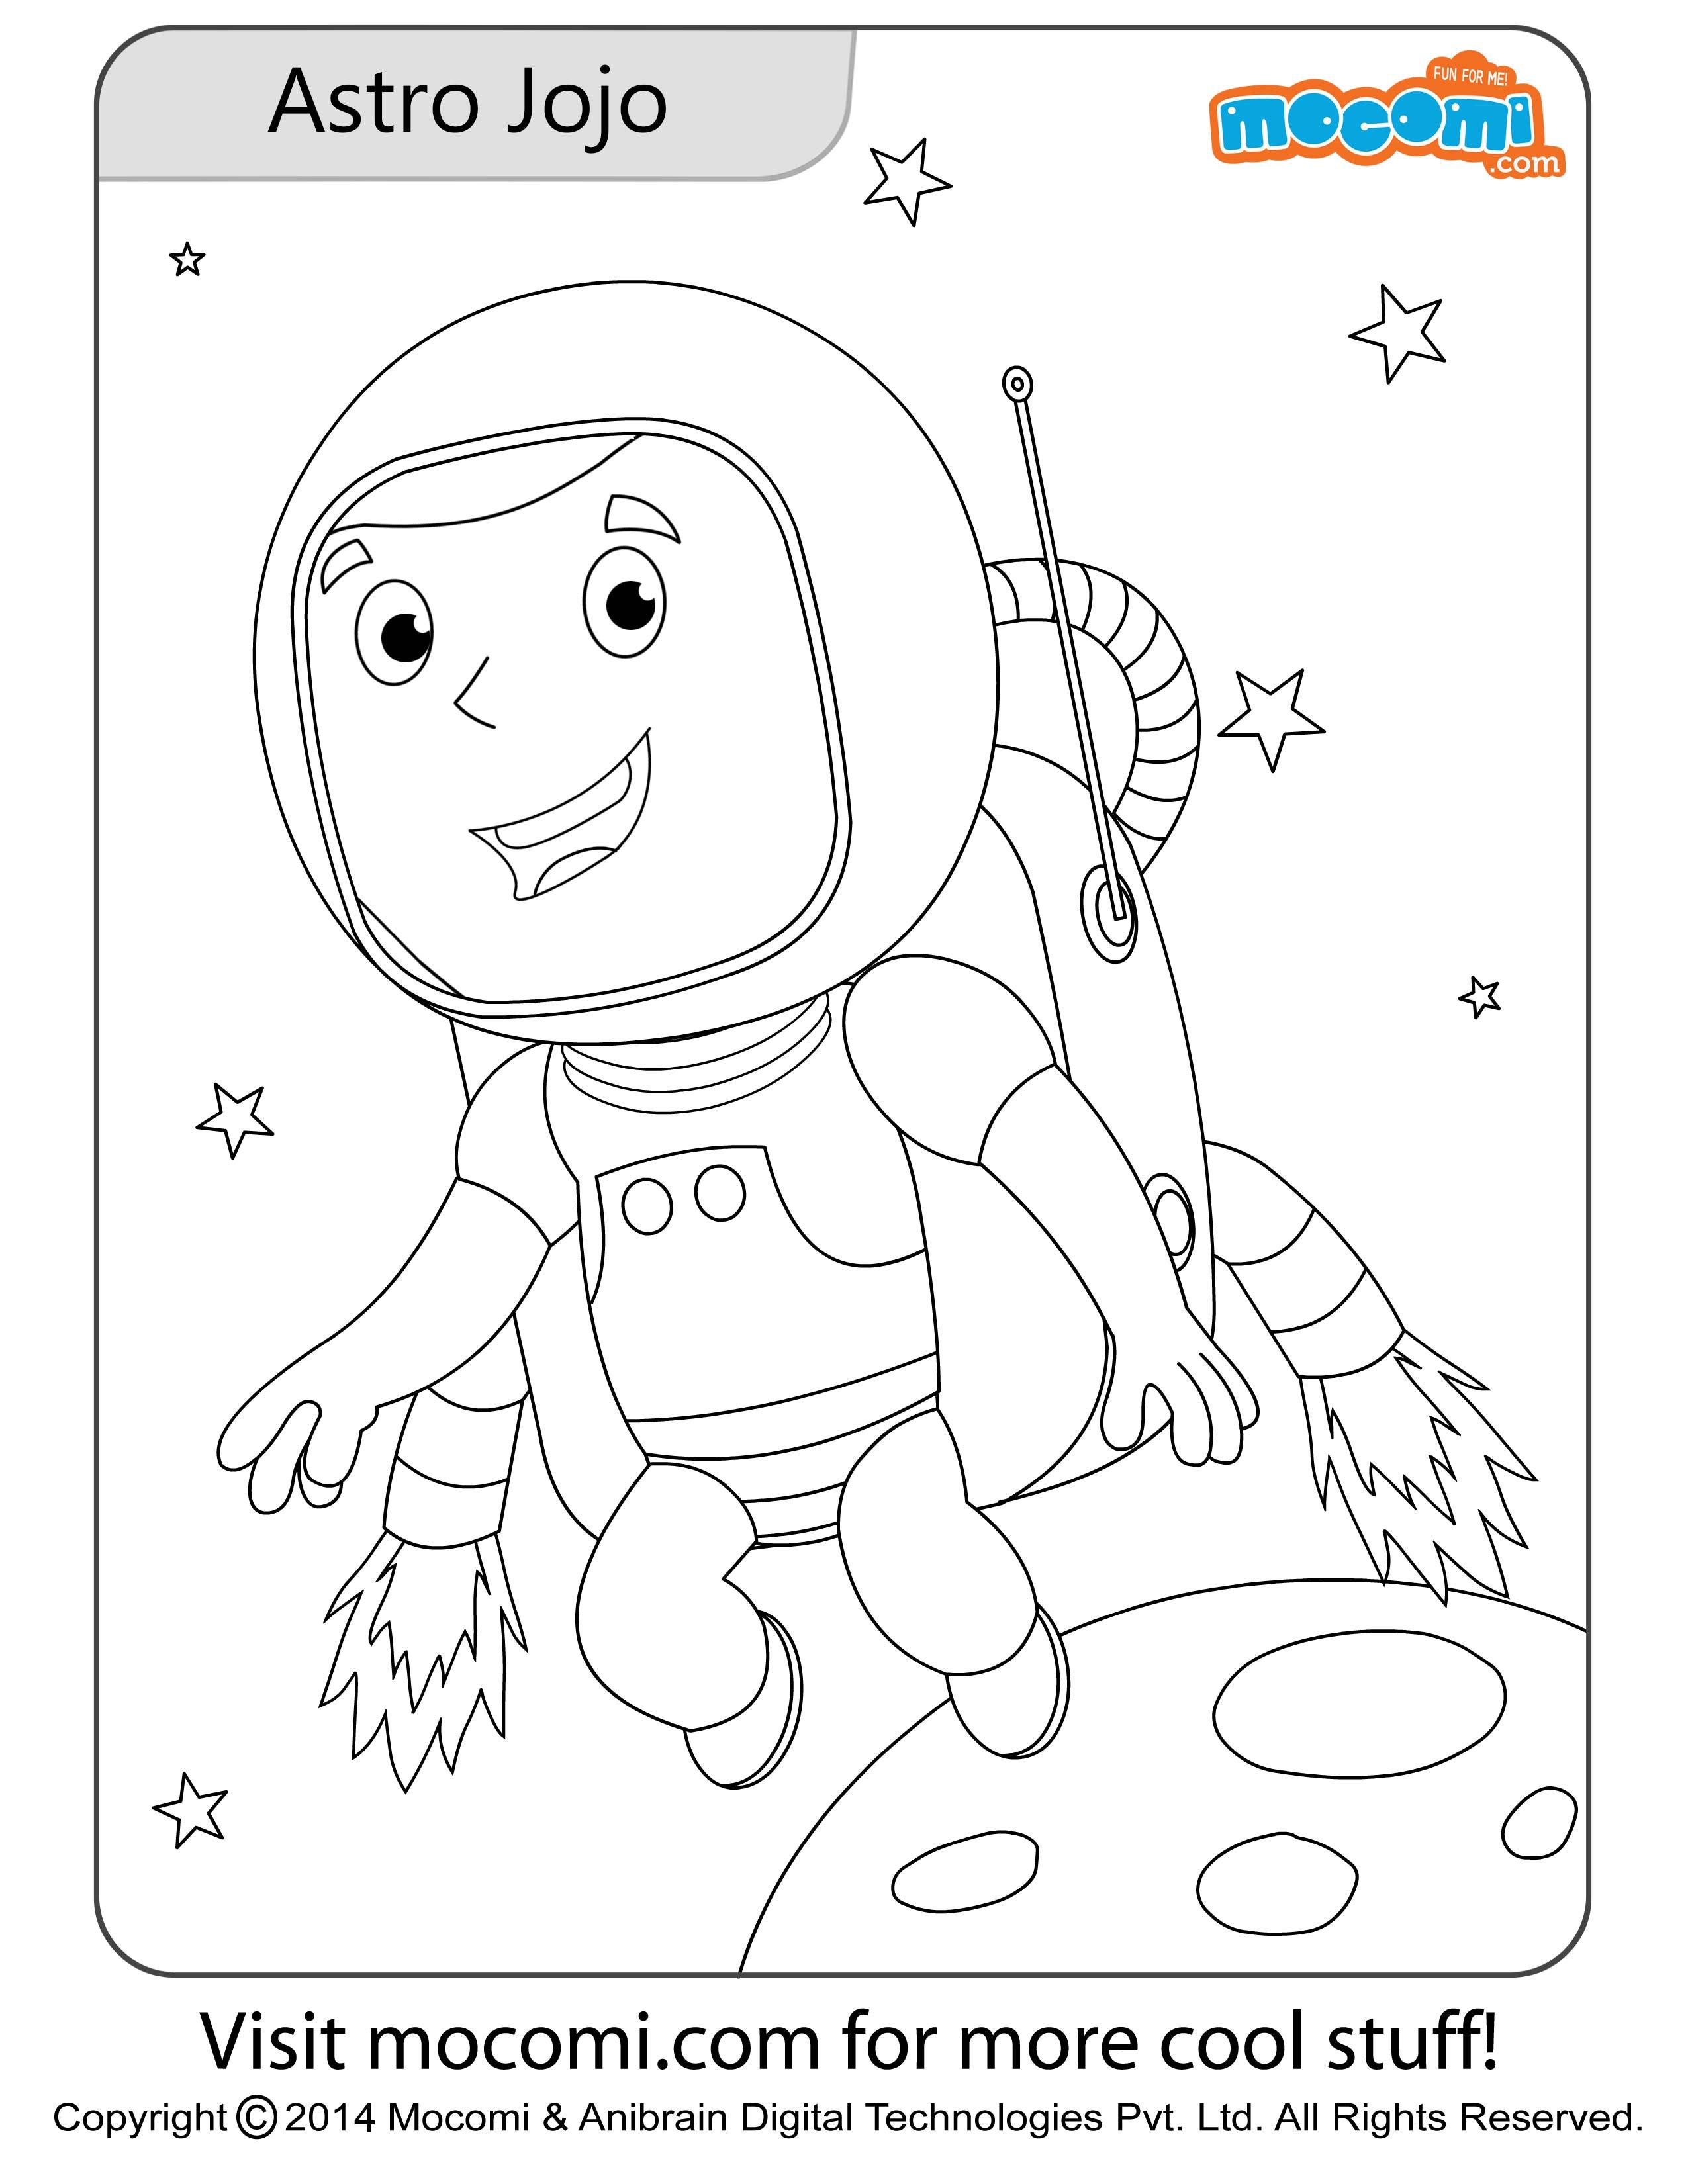 Astronaut Jojo – Colouring Page